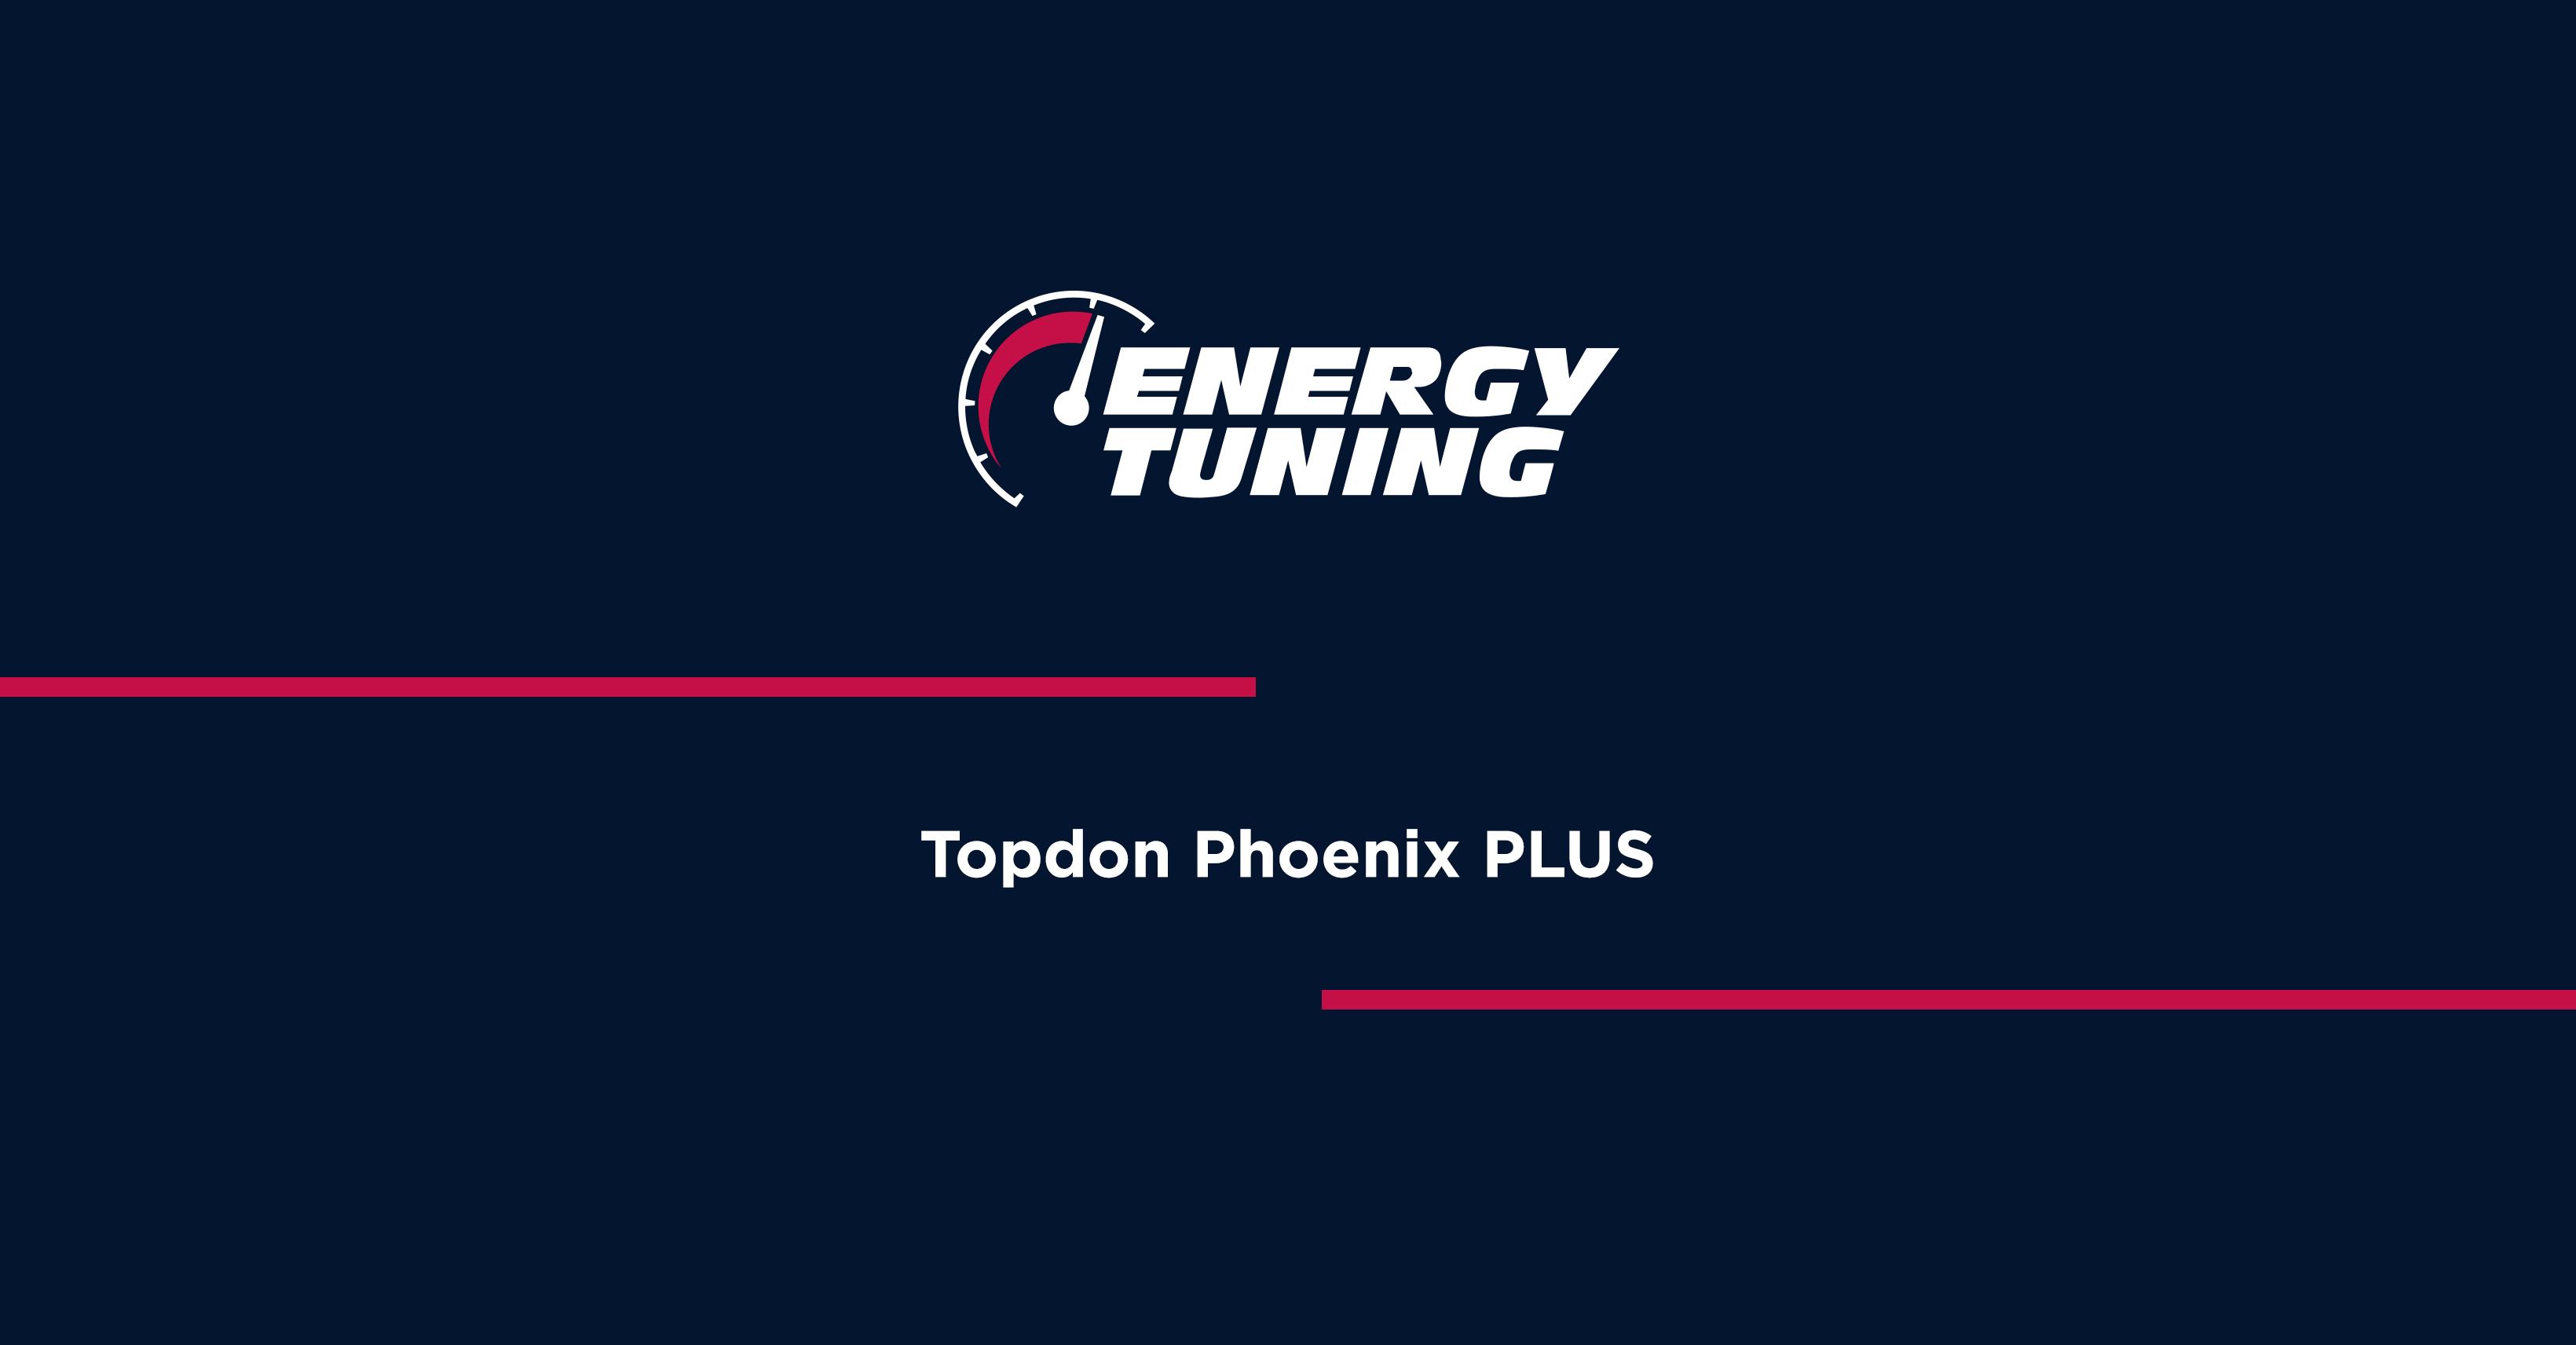 Topdon Phoenix PLUS